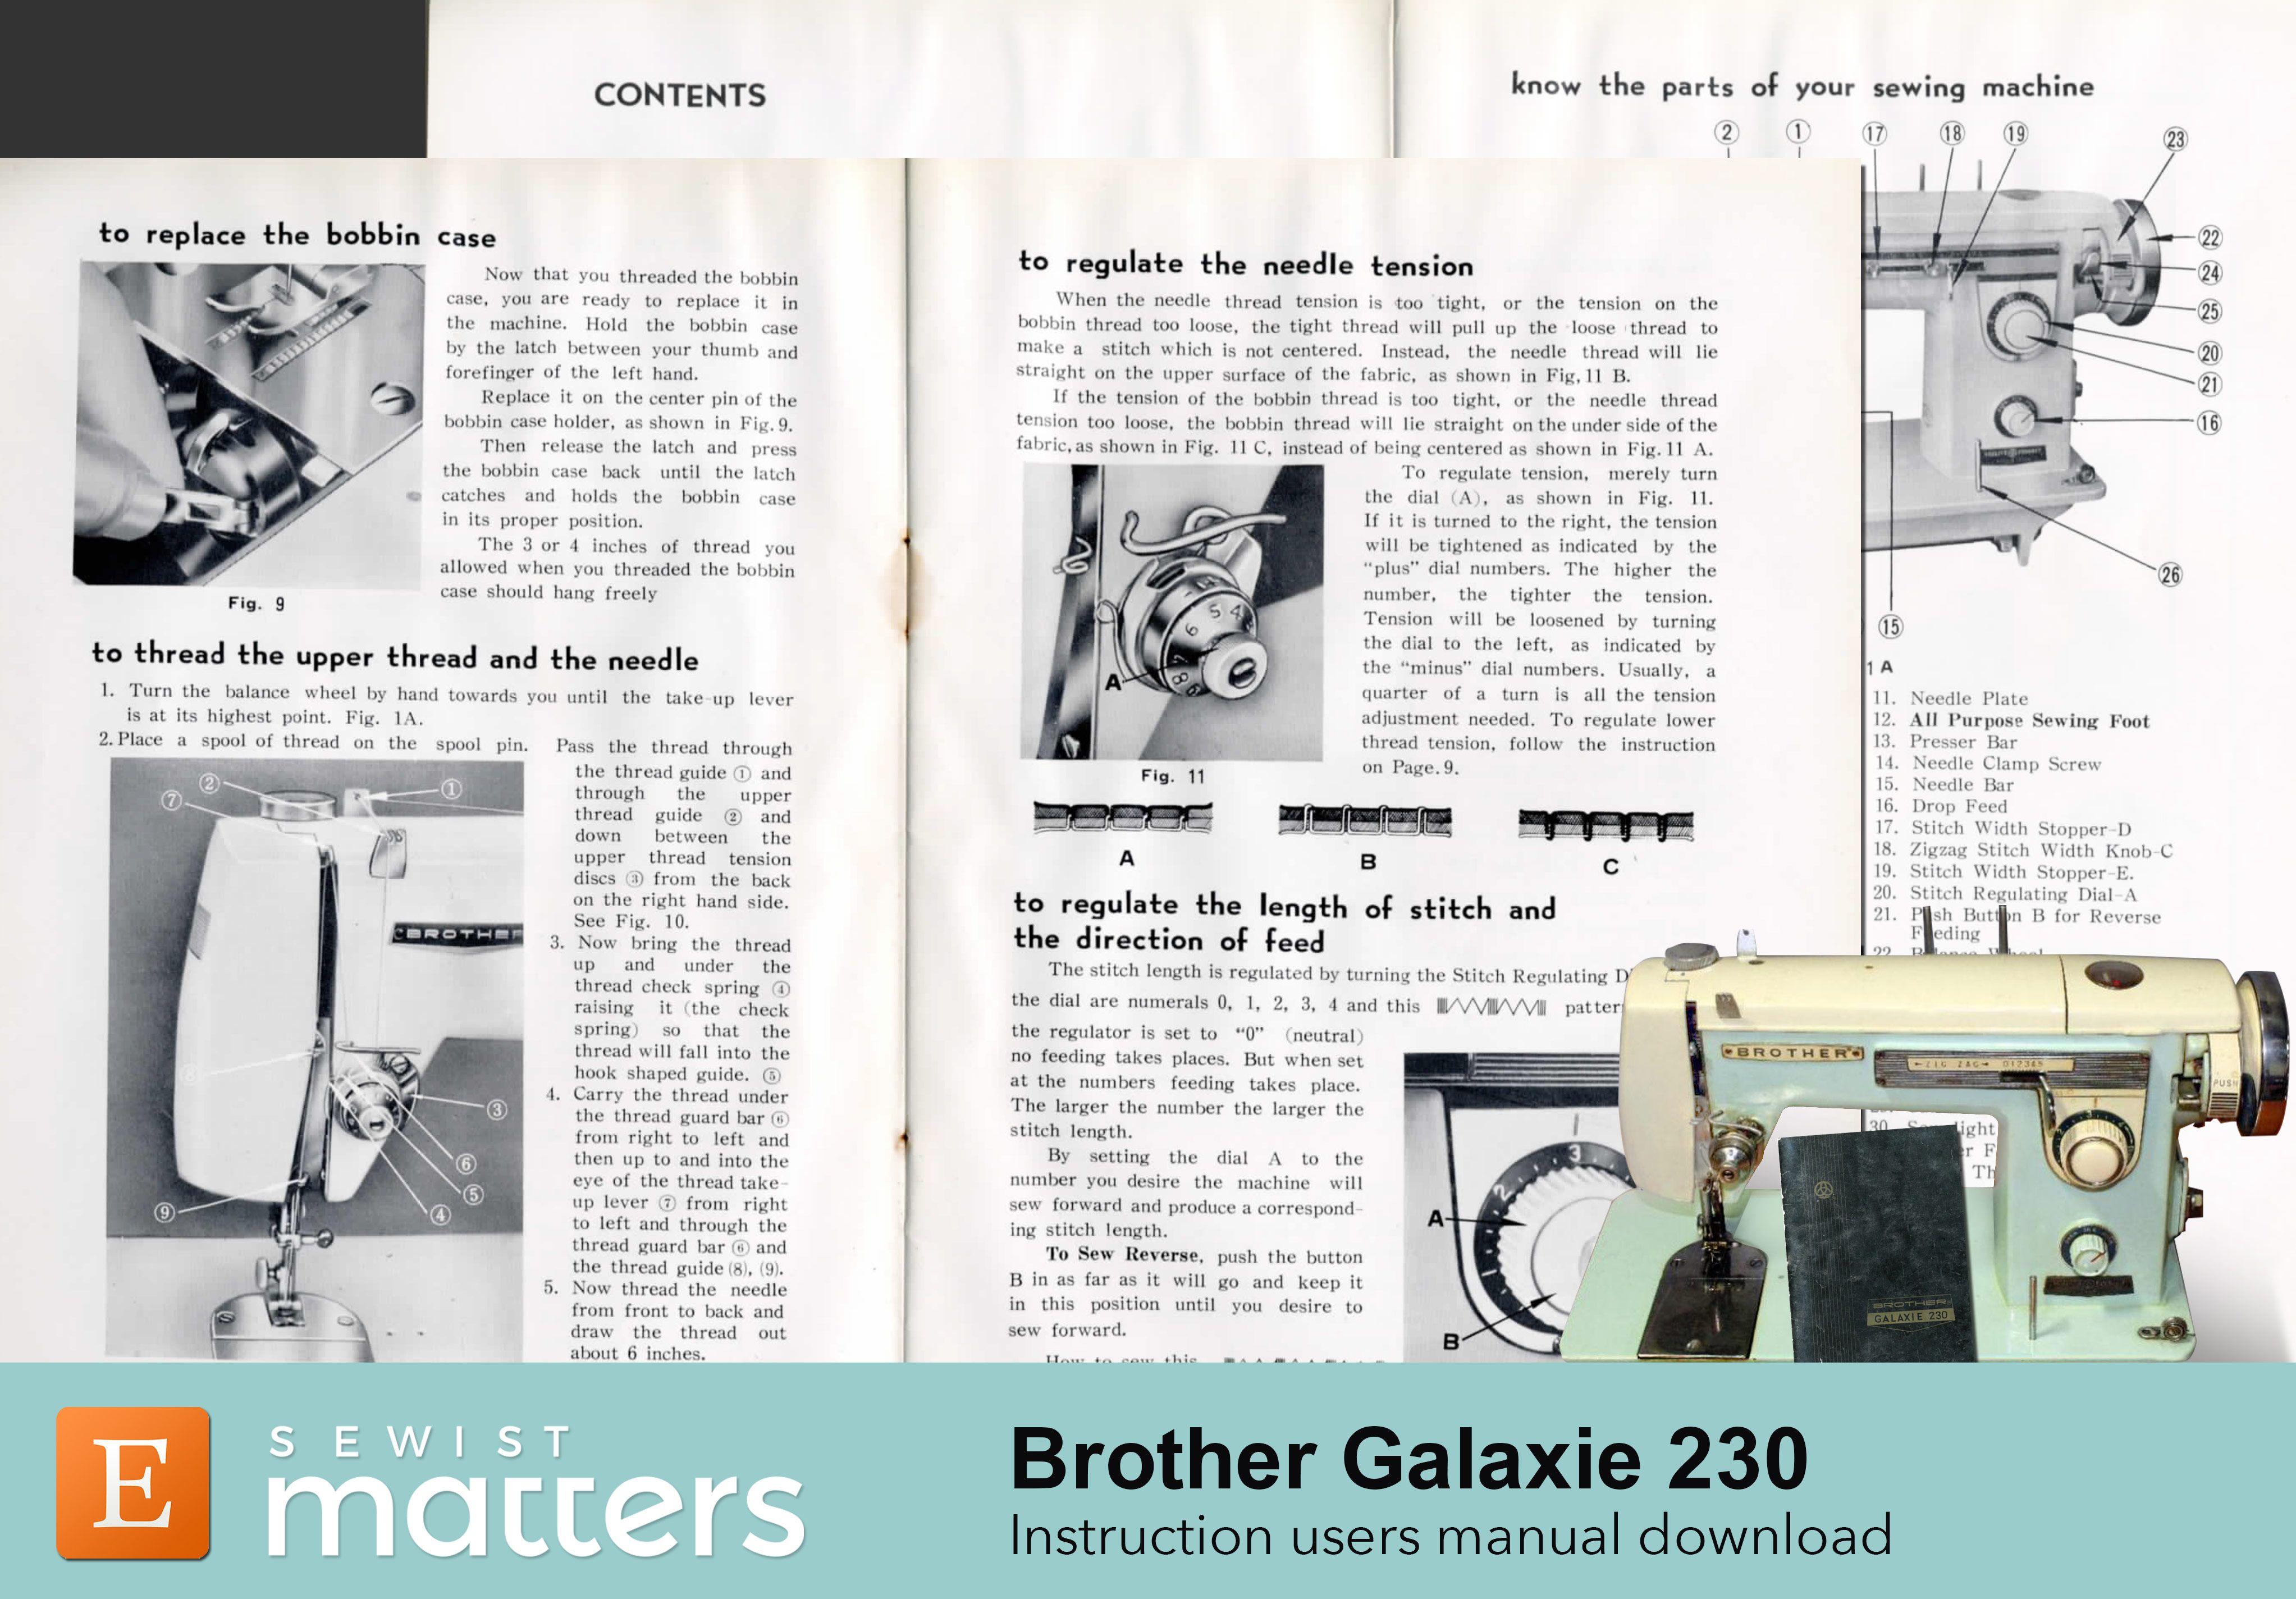 Vintage Remington Super Deluxe 142-B Automatic ZigZag Sewing Machine Manual PDF Download